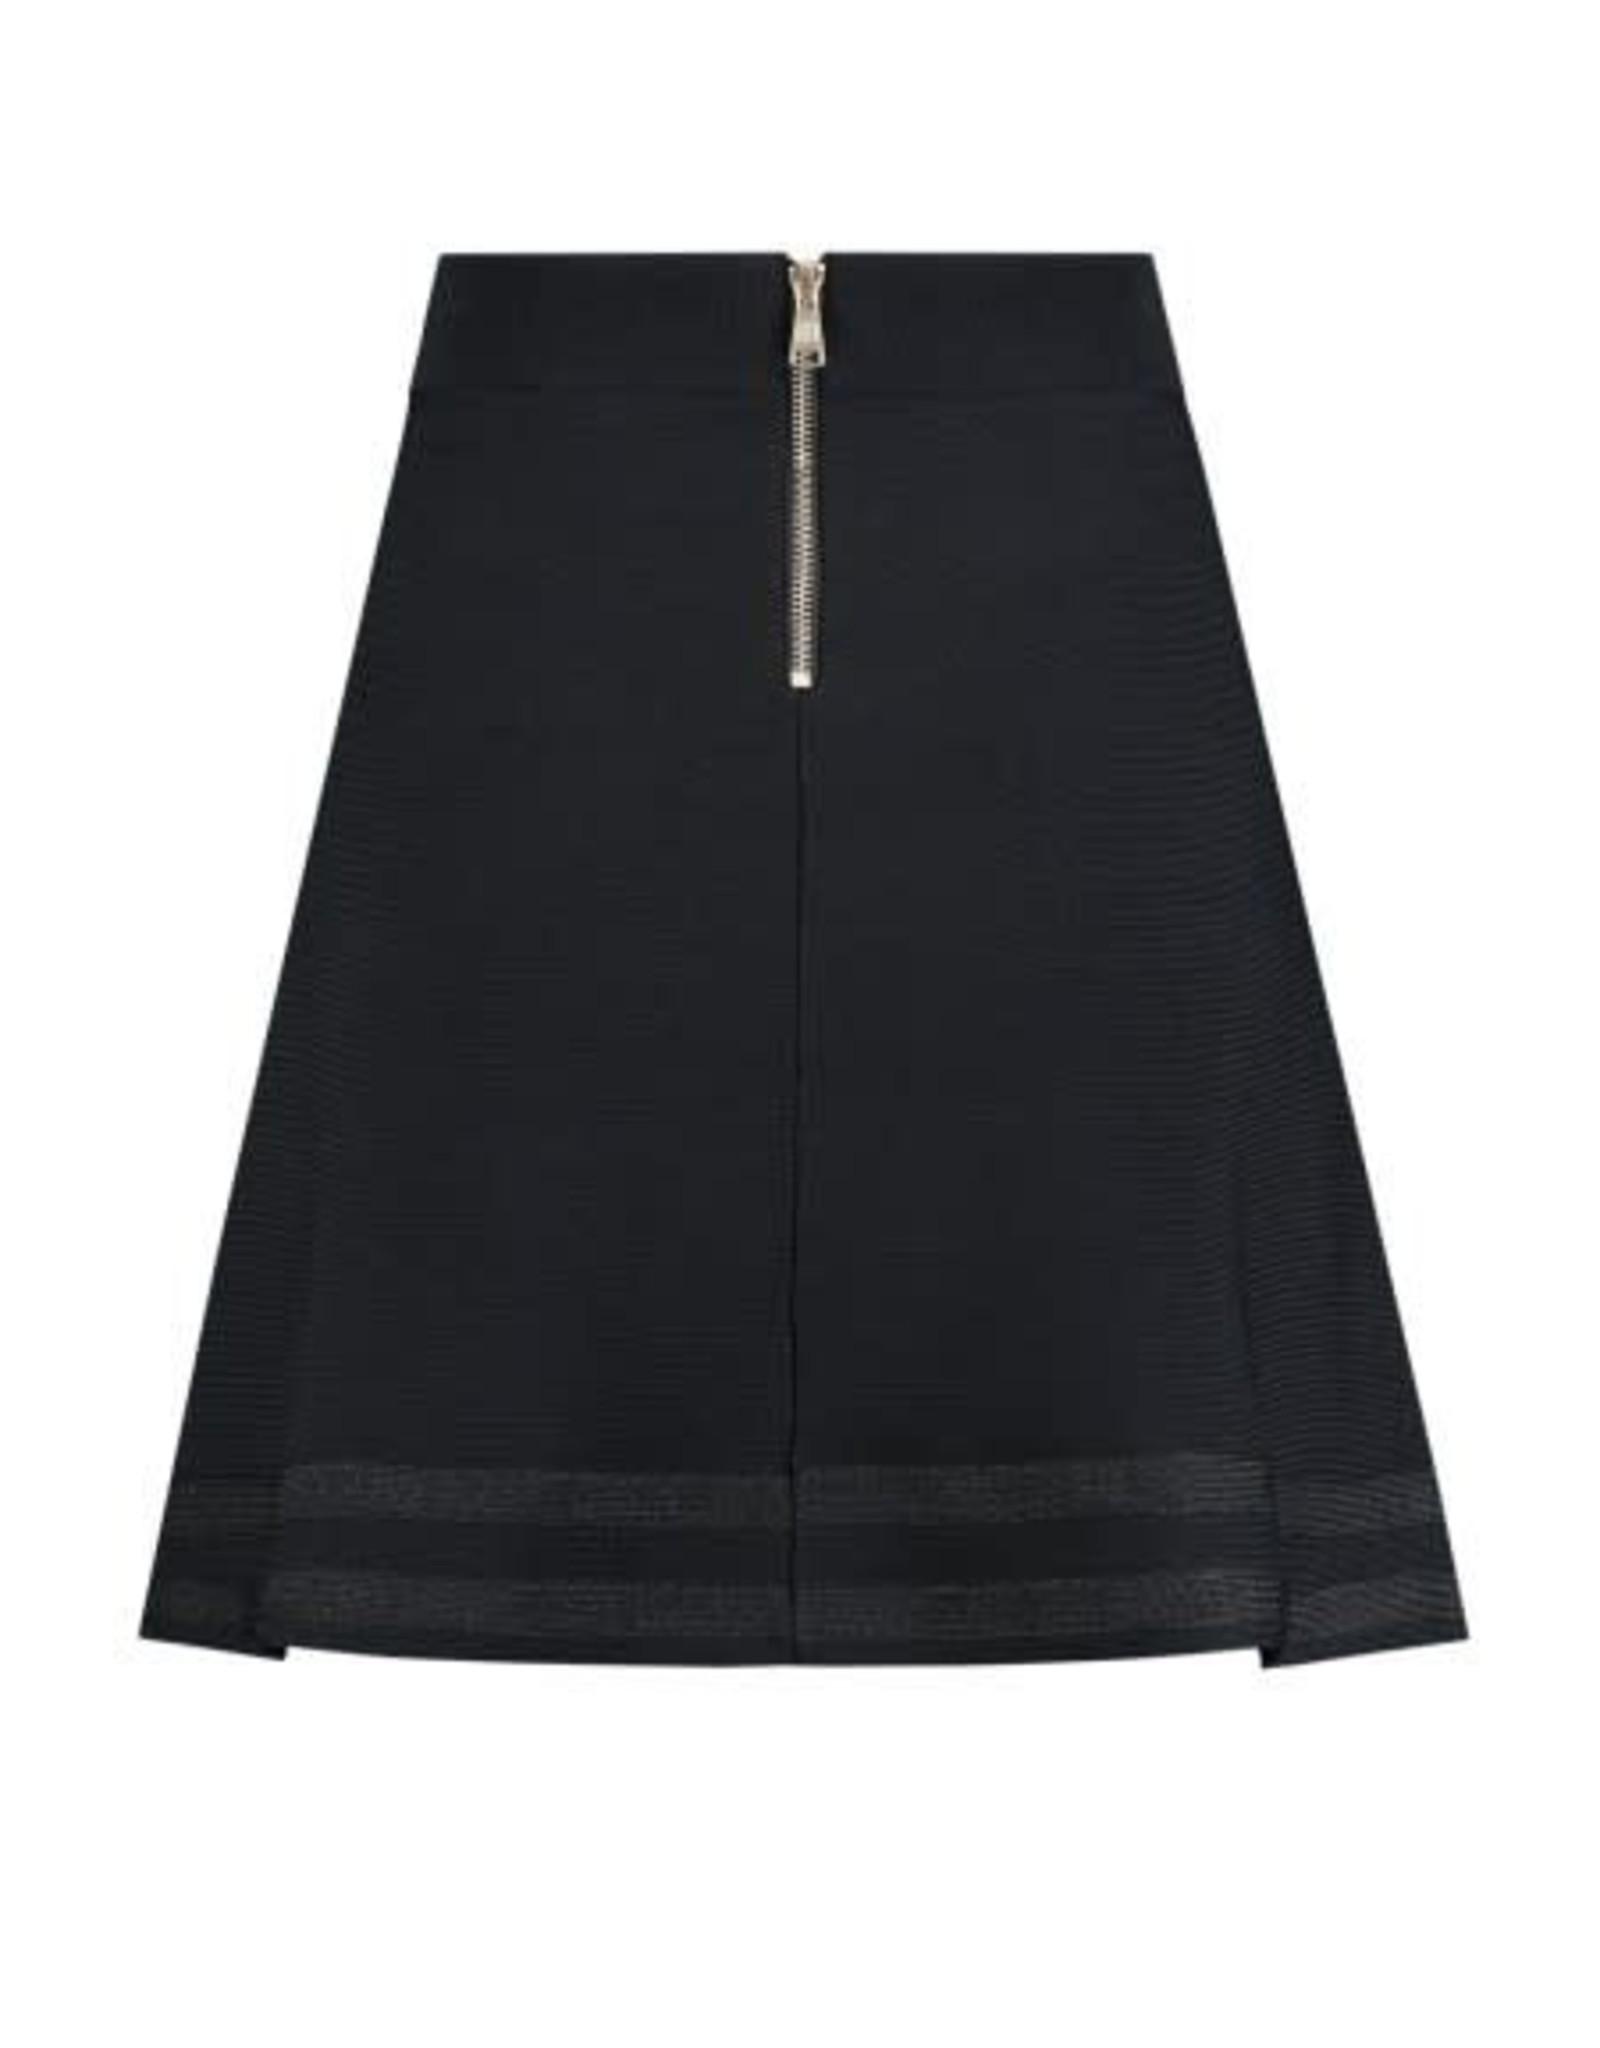 Kate Moss Jazz Skirt